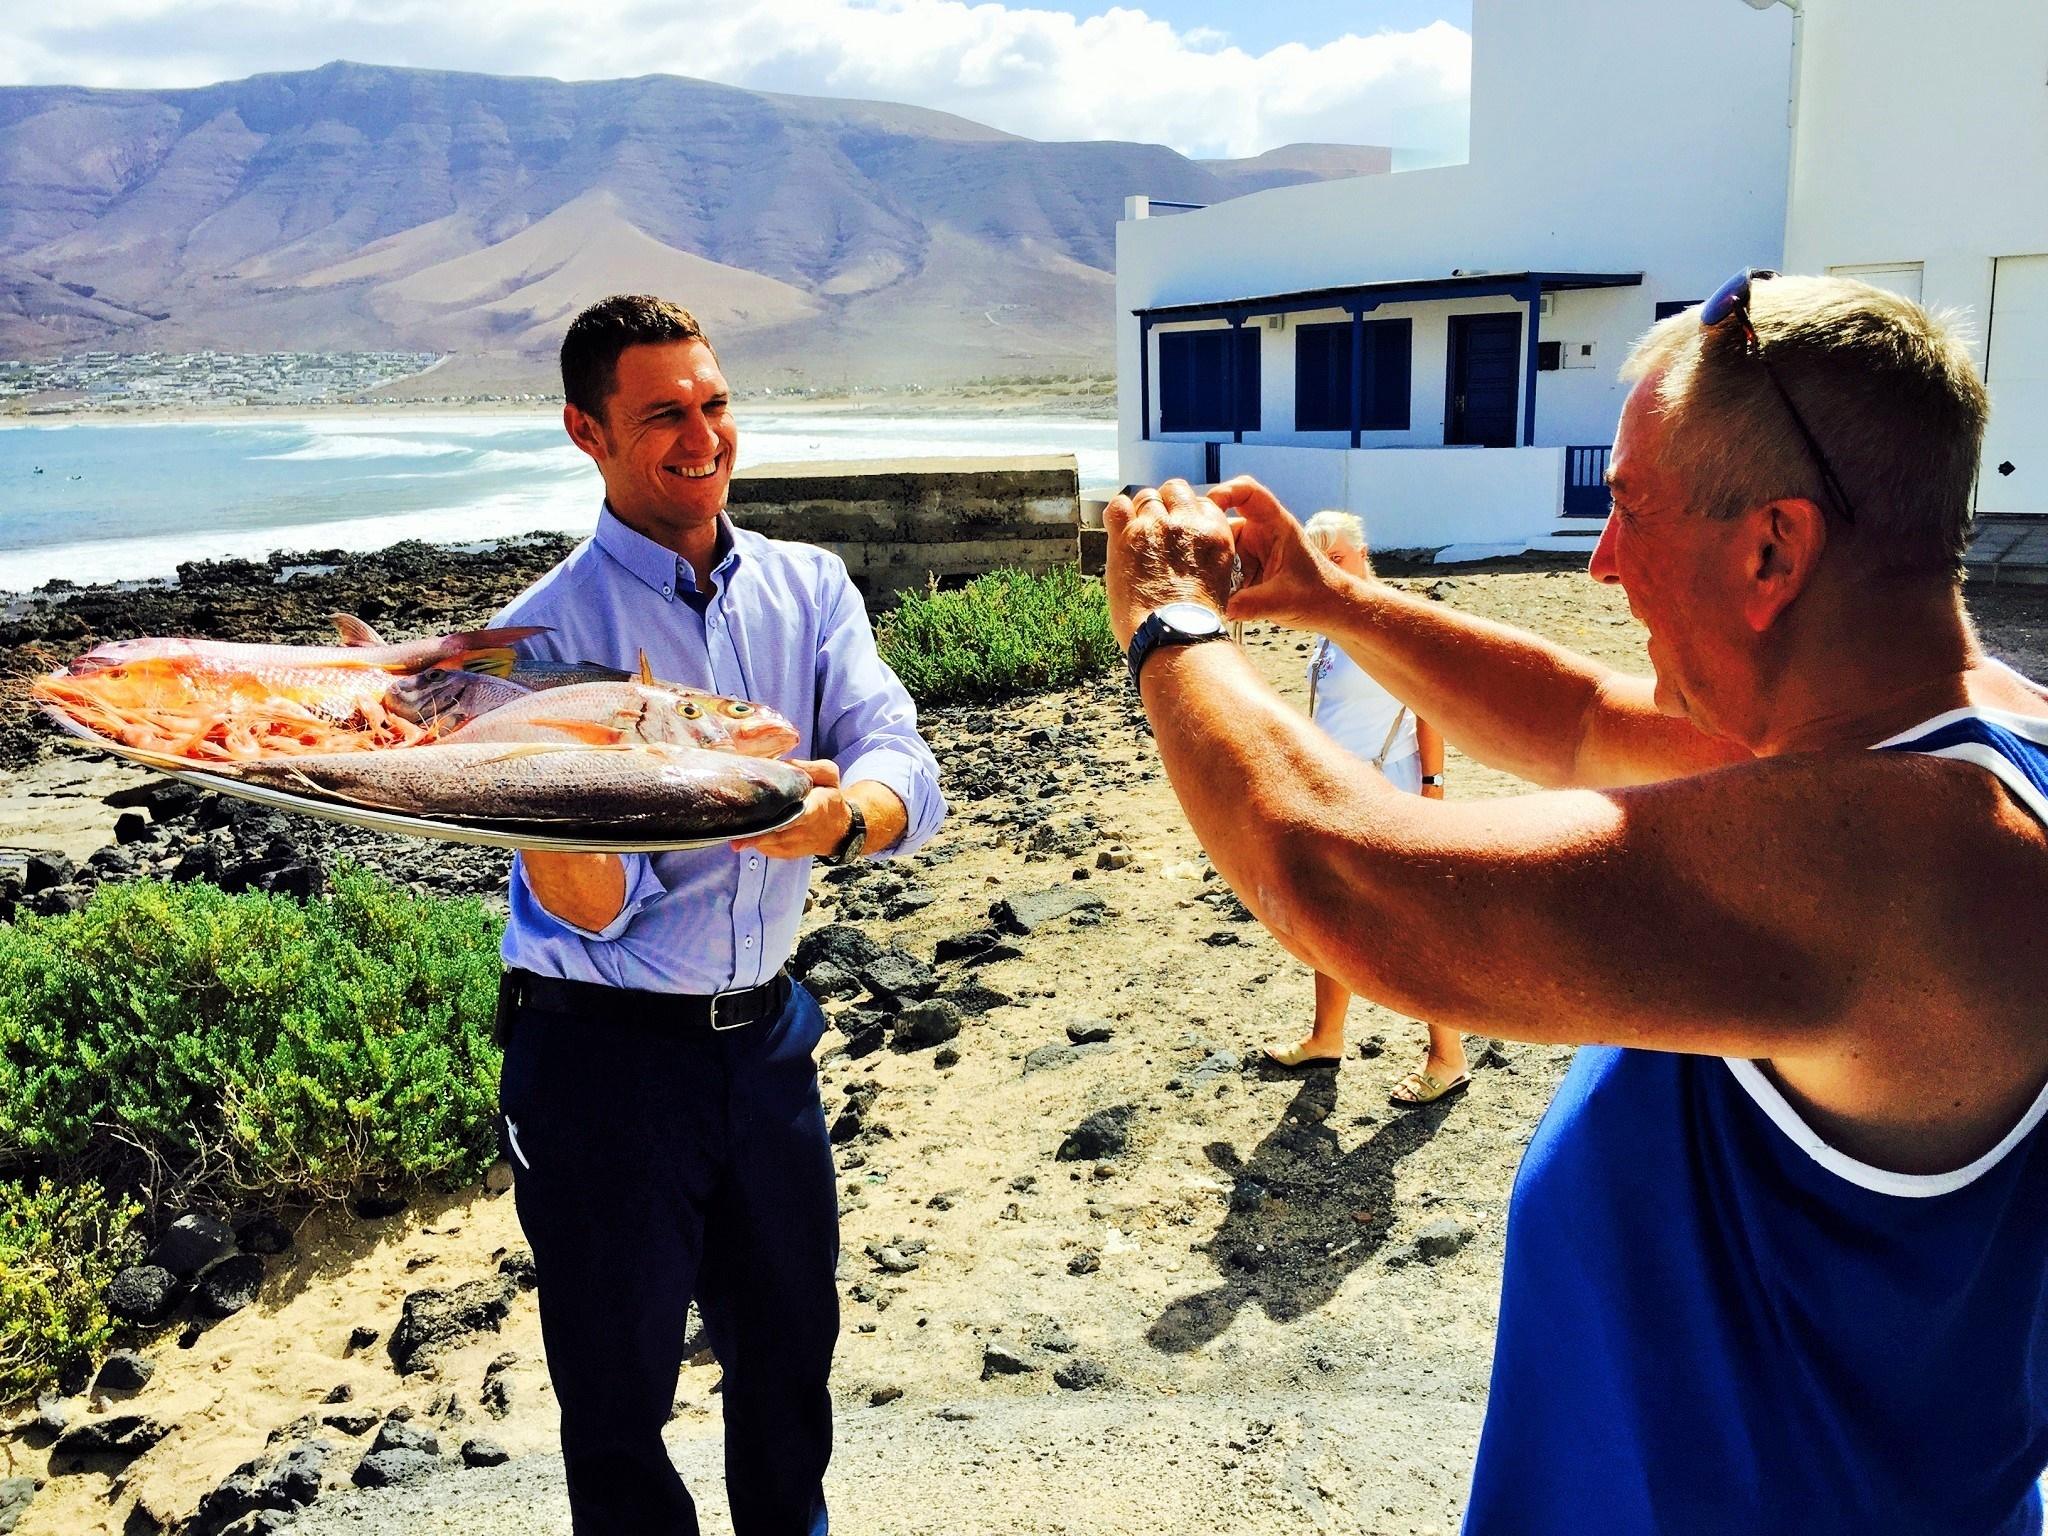 Turista sorprendido con pescado